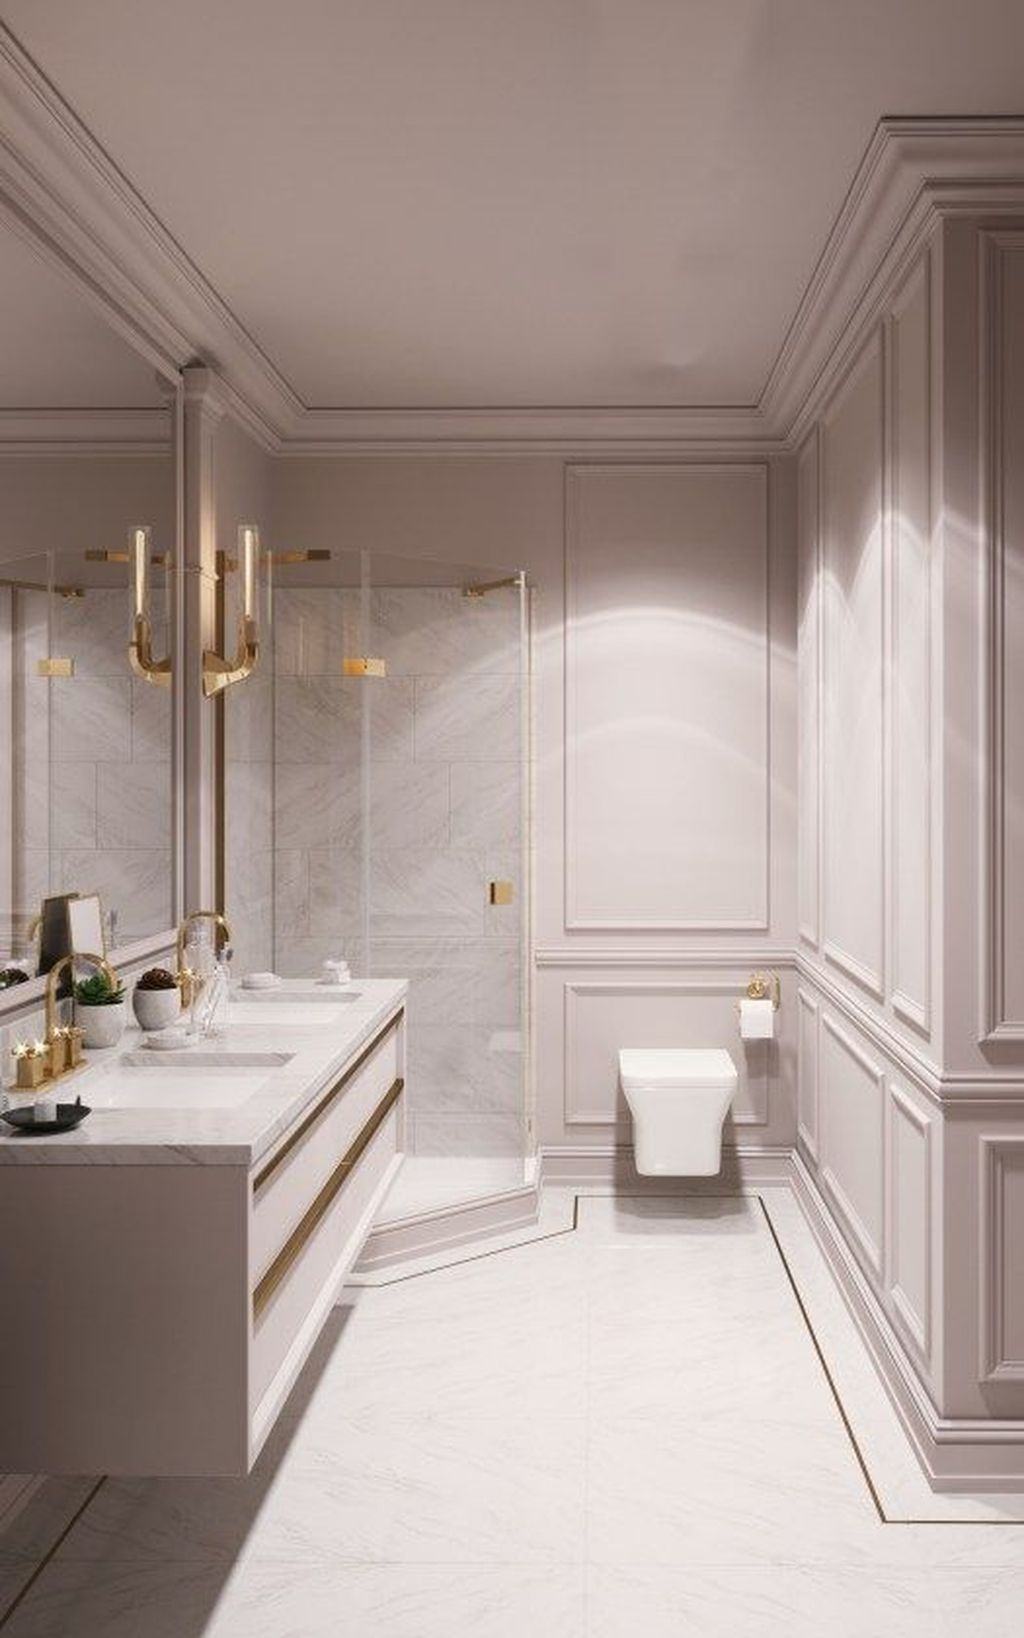 European Neoclassical Bathroom Design 3d Bathroom Design Neoclassical Bathroom Design Small Luxury Bathrooms